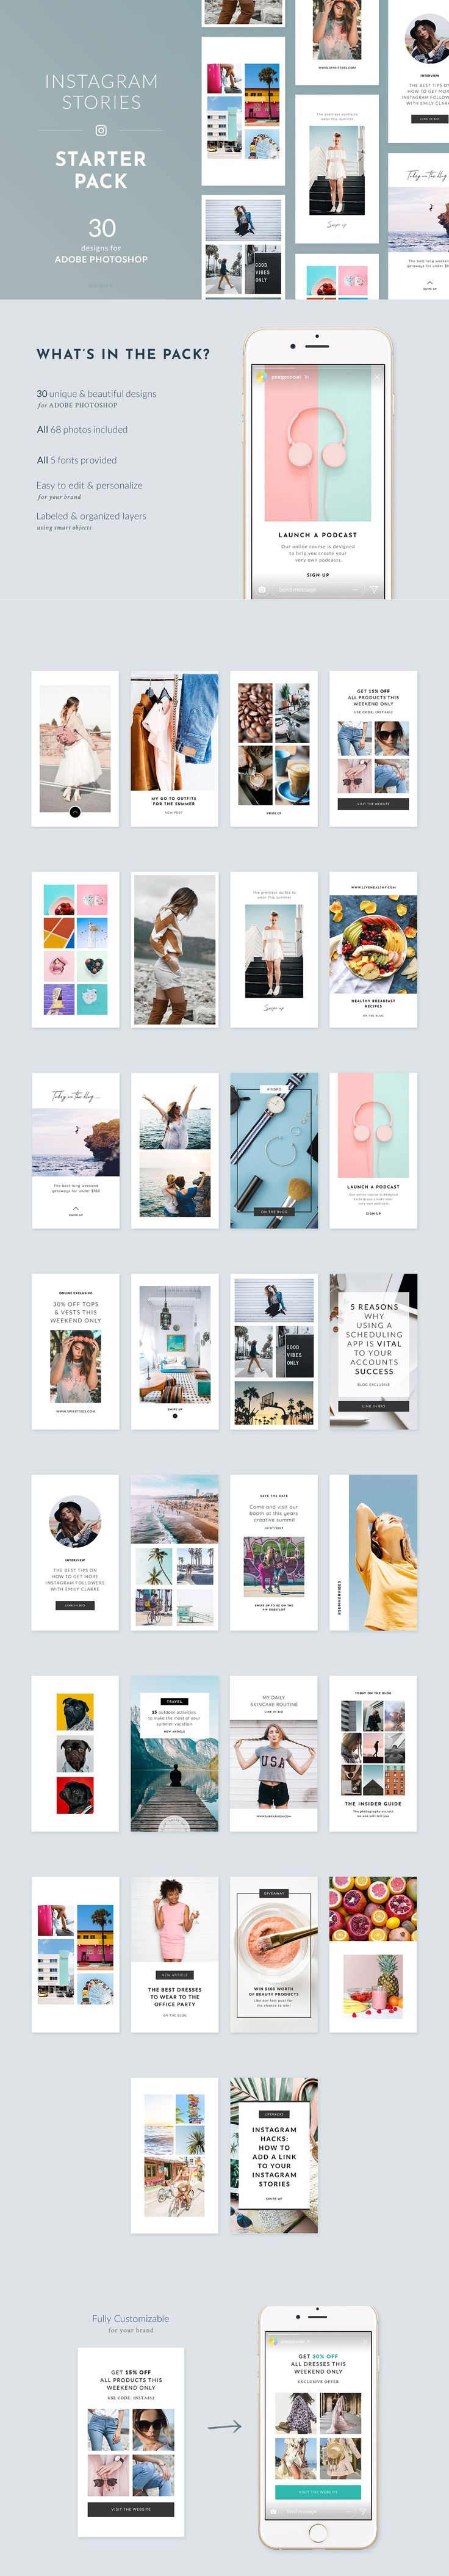 medium resolution of instagram stories starter pack